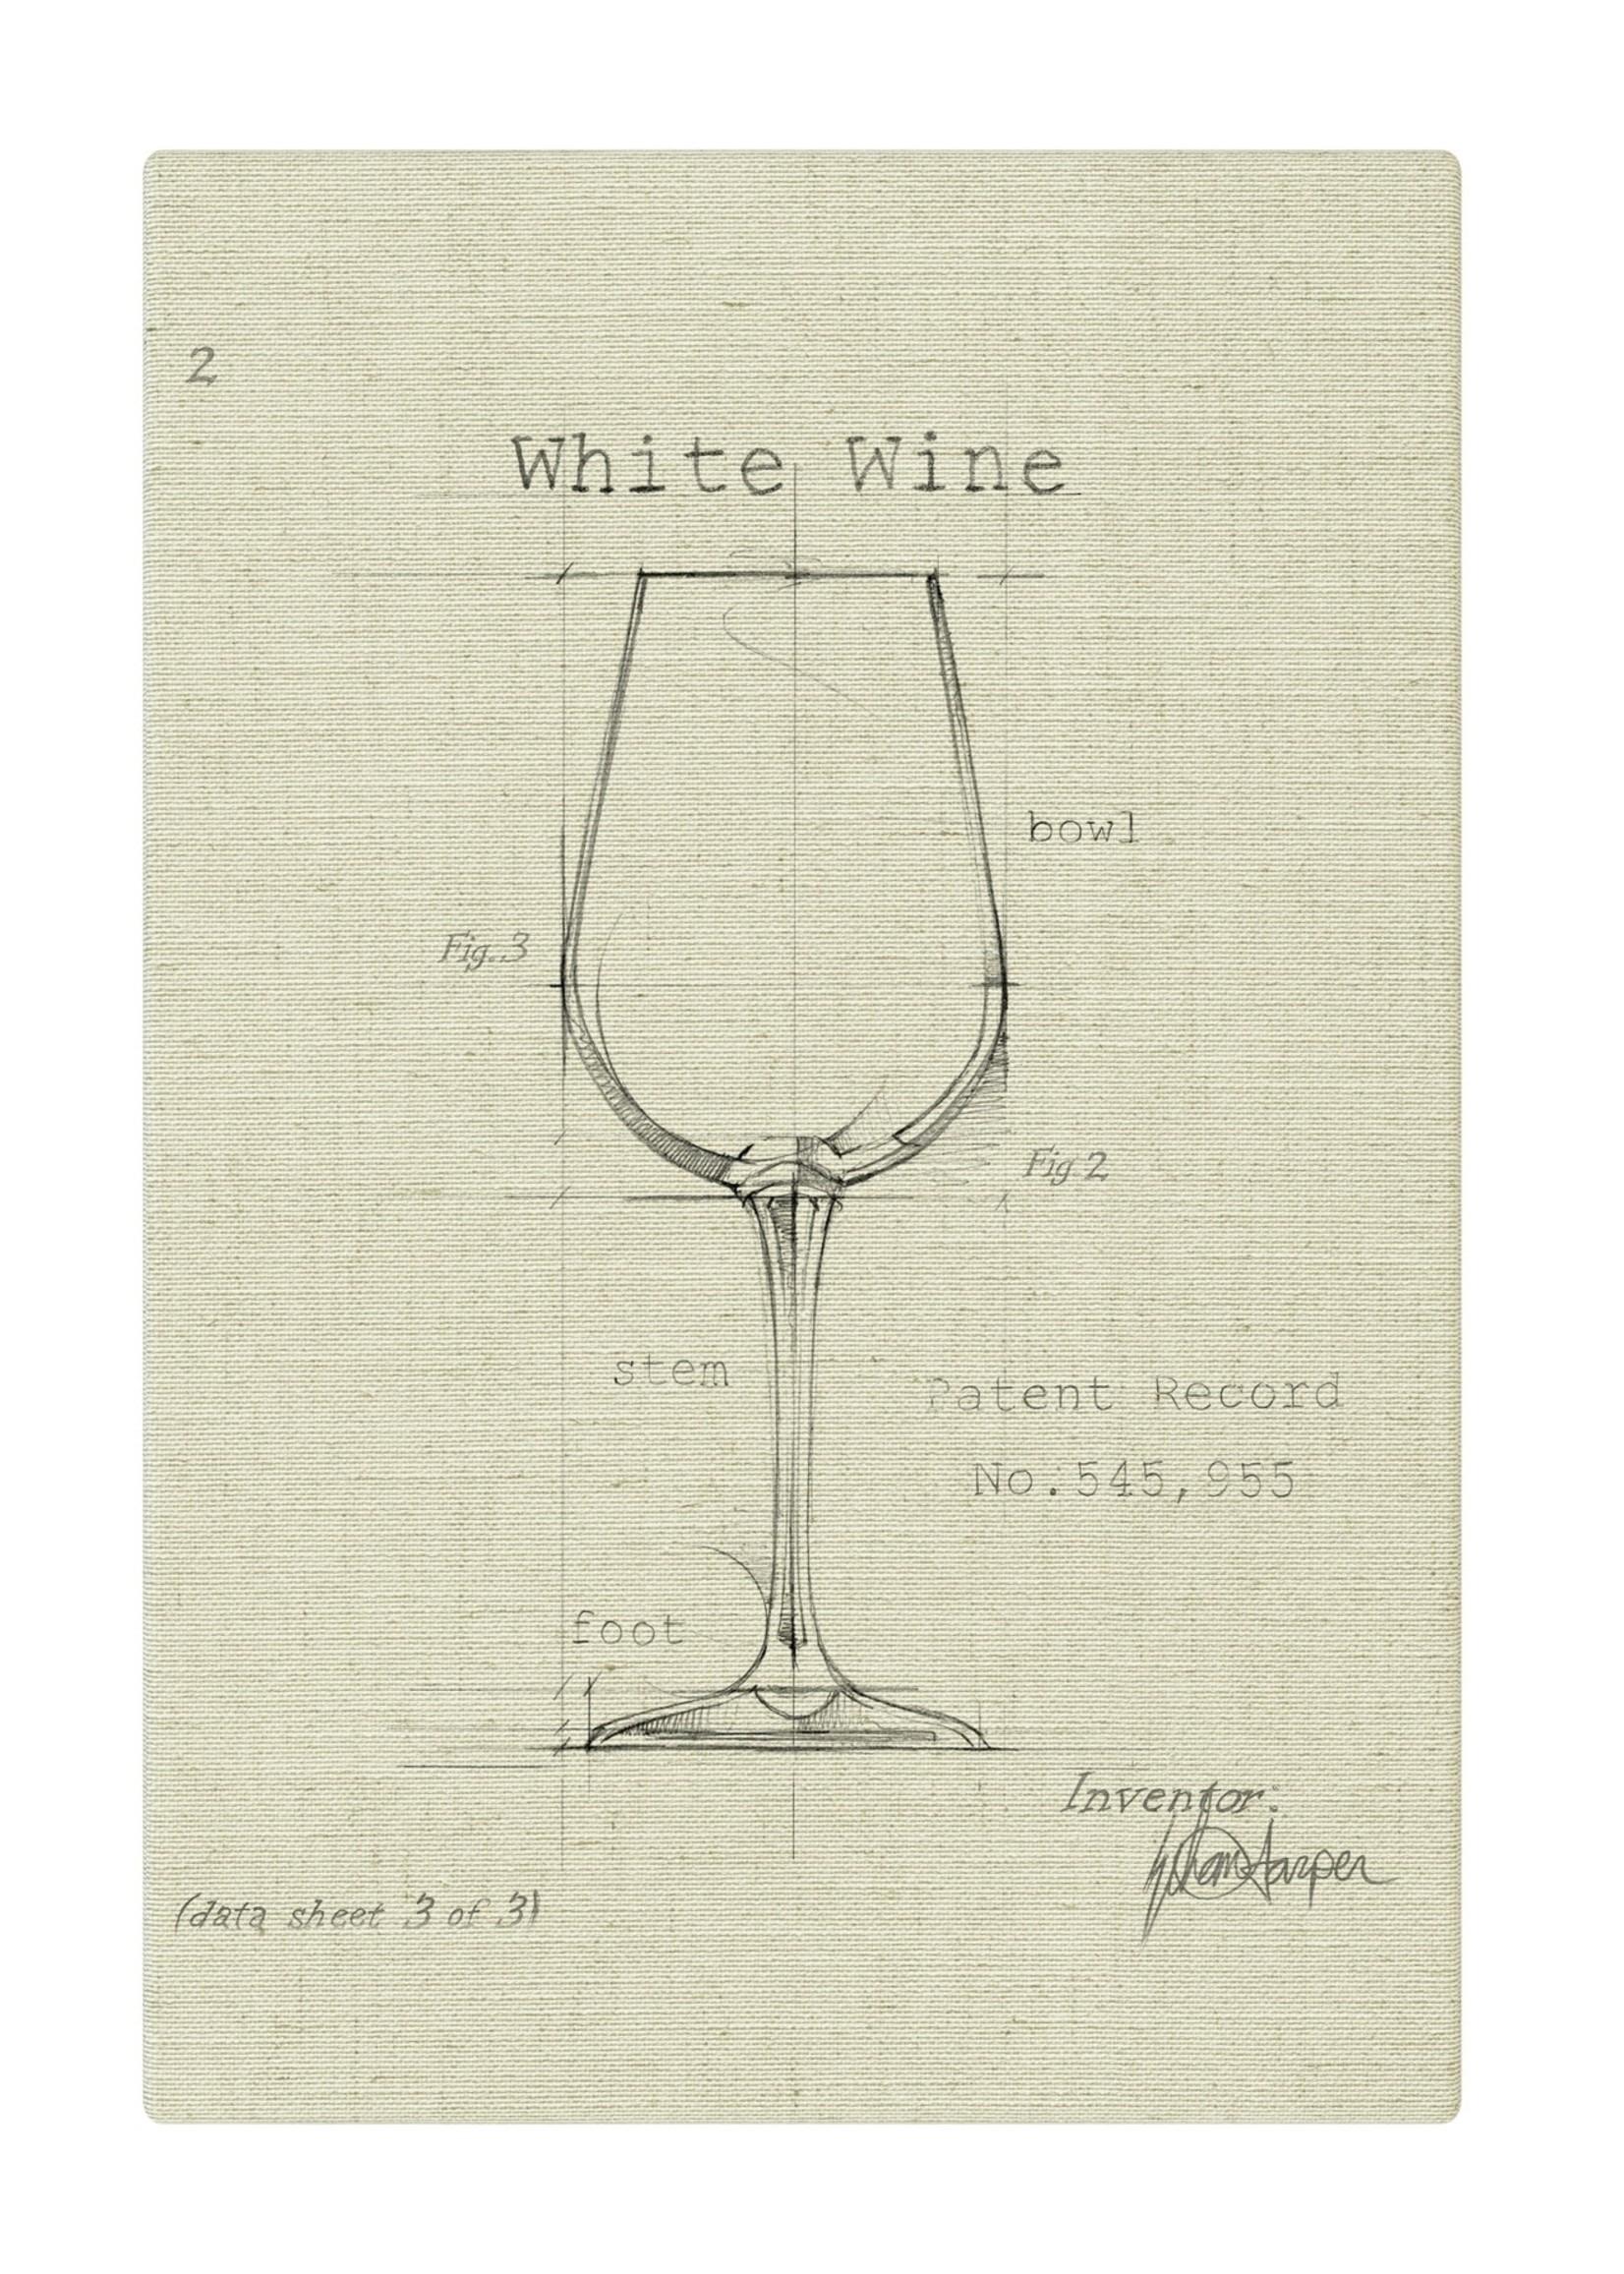 Barware White Wine Fabric Gallery Wrapped Art - Off White 12x18